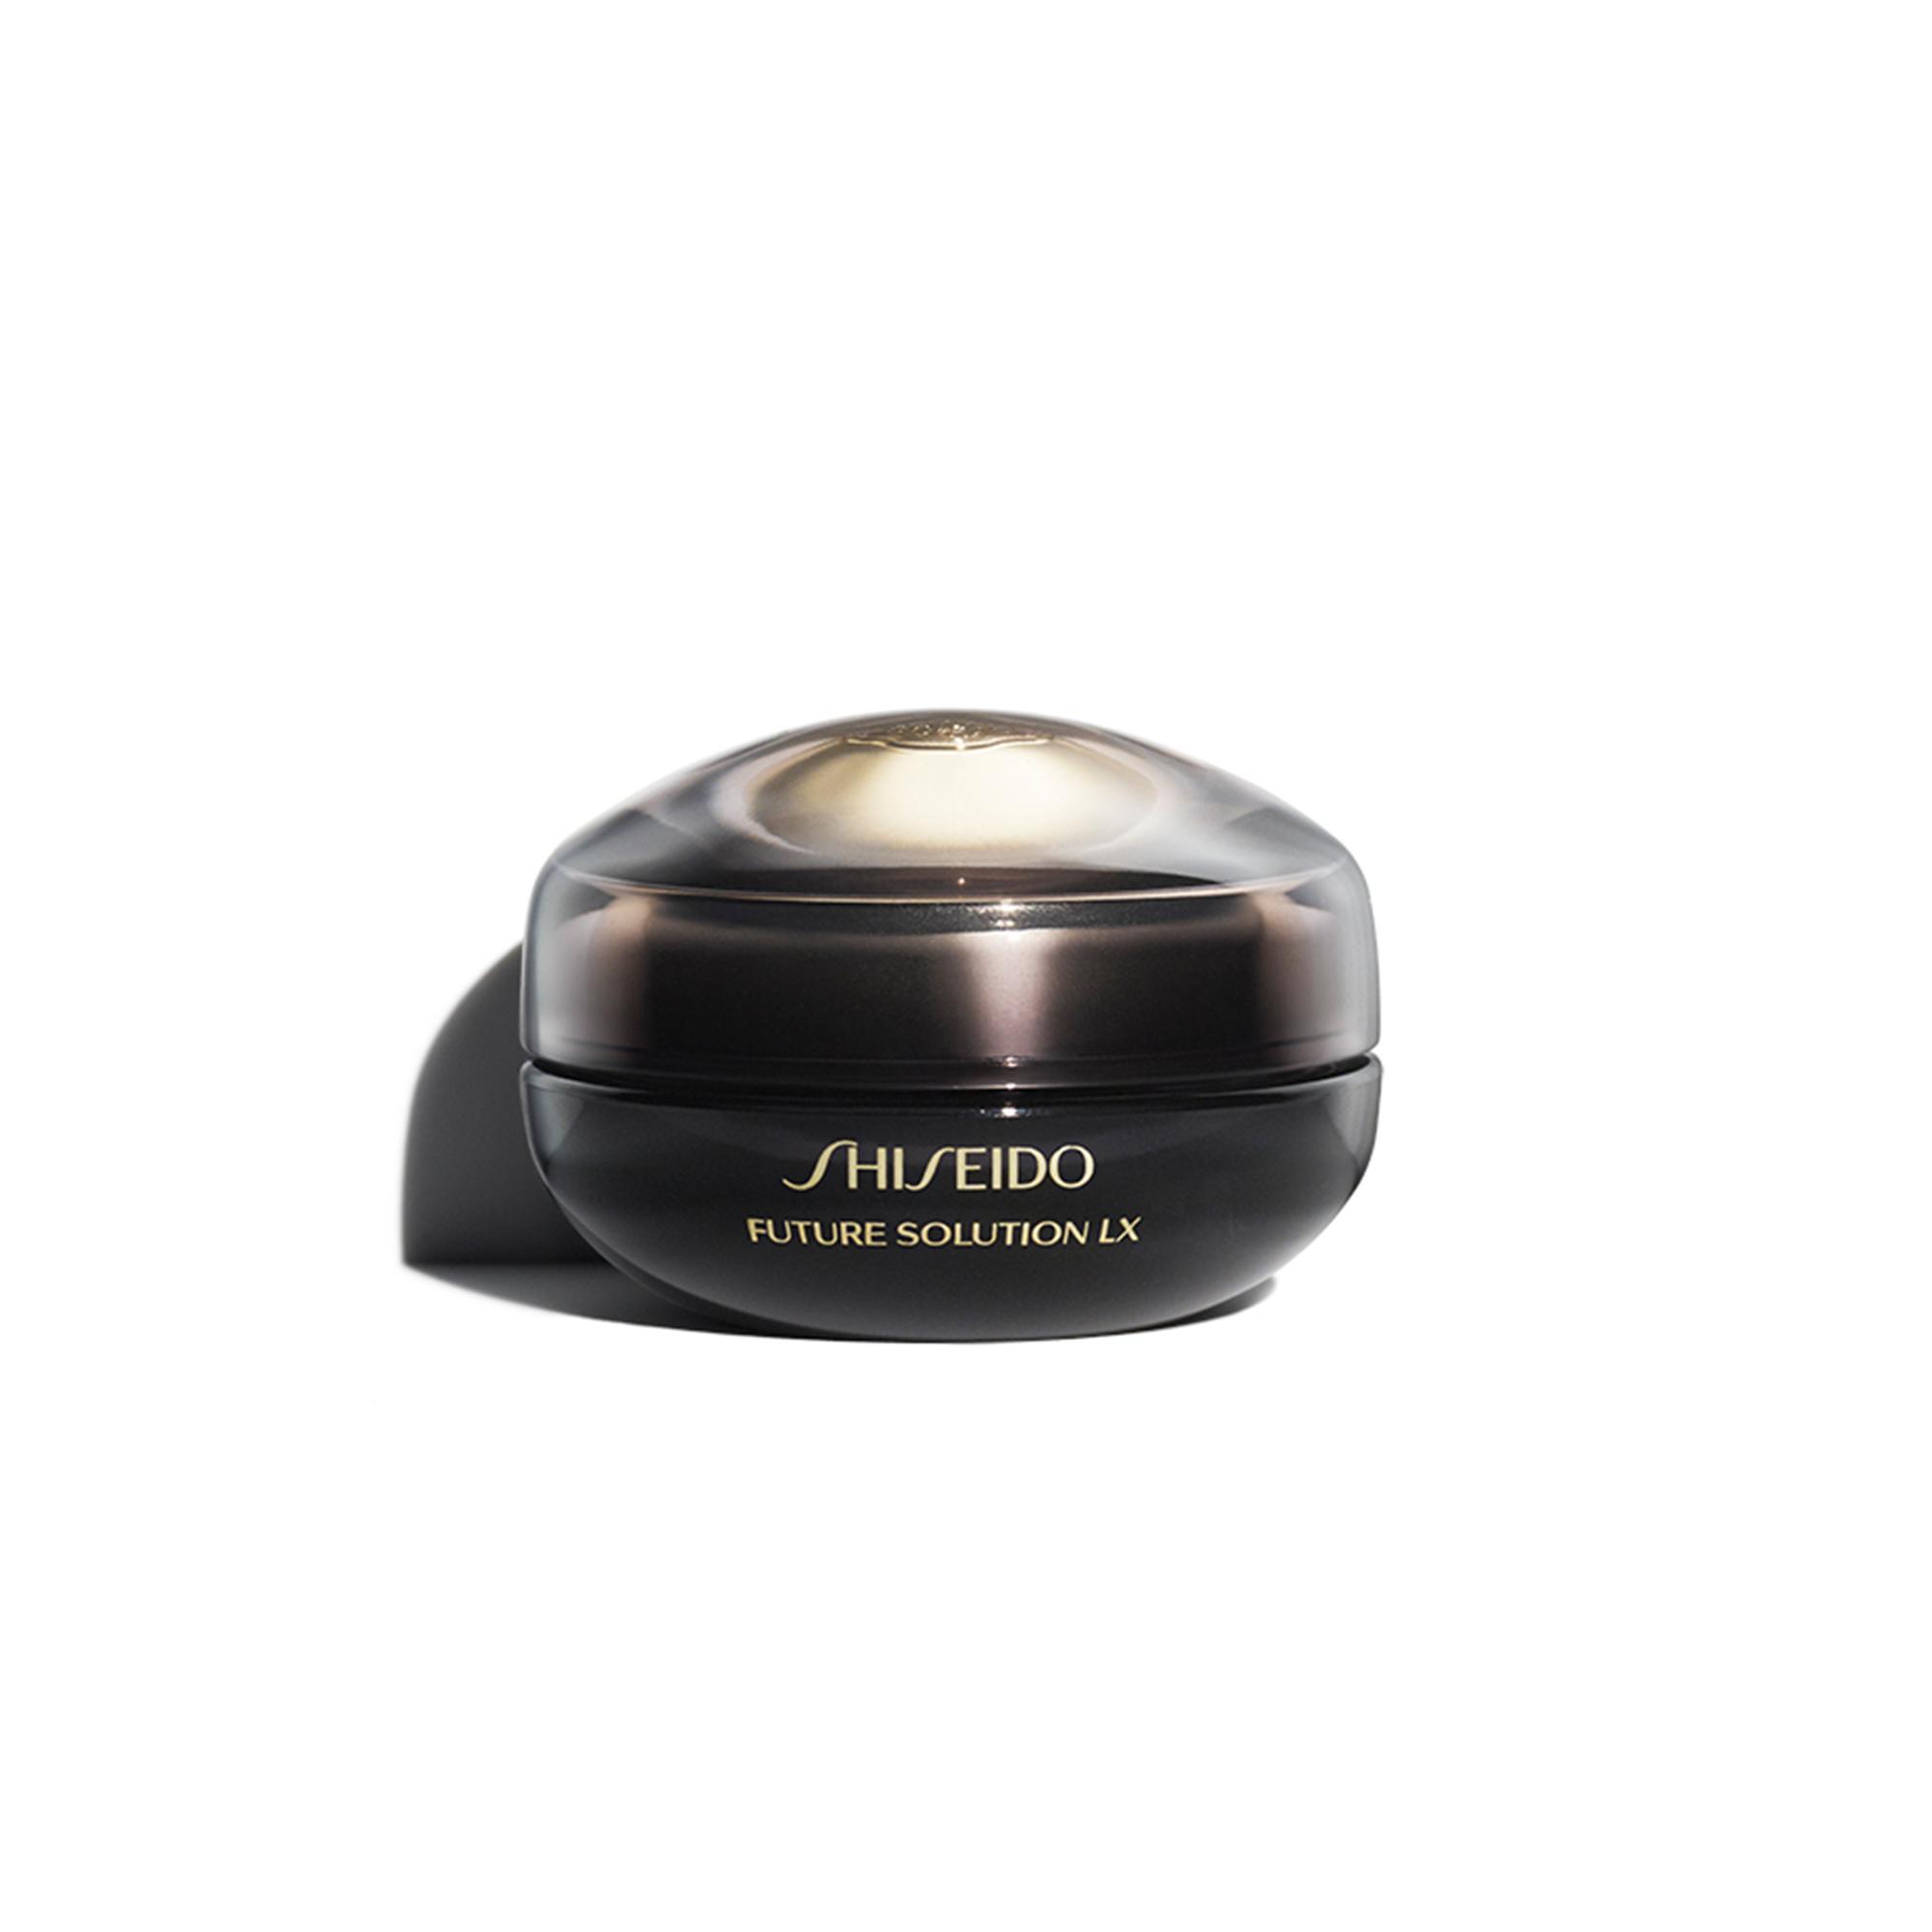 Future Soloution LX Eye & Lip Contour Regenerating Cream 15ml